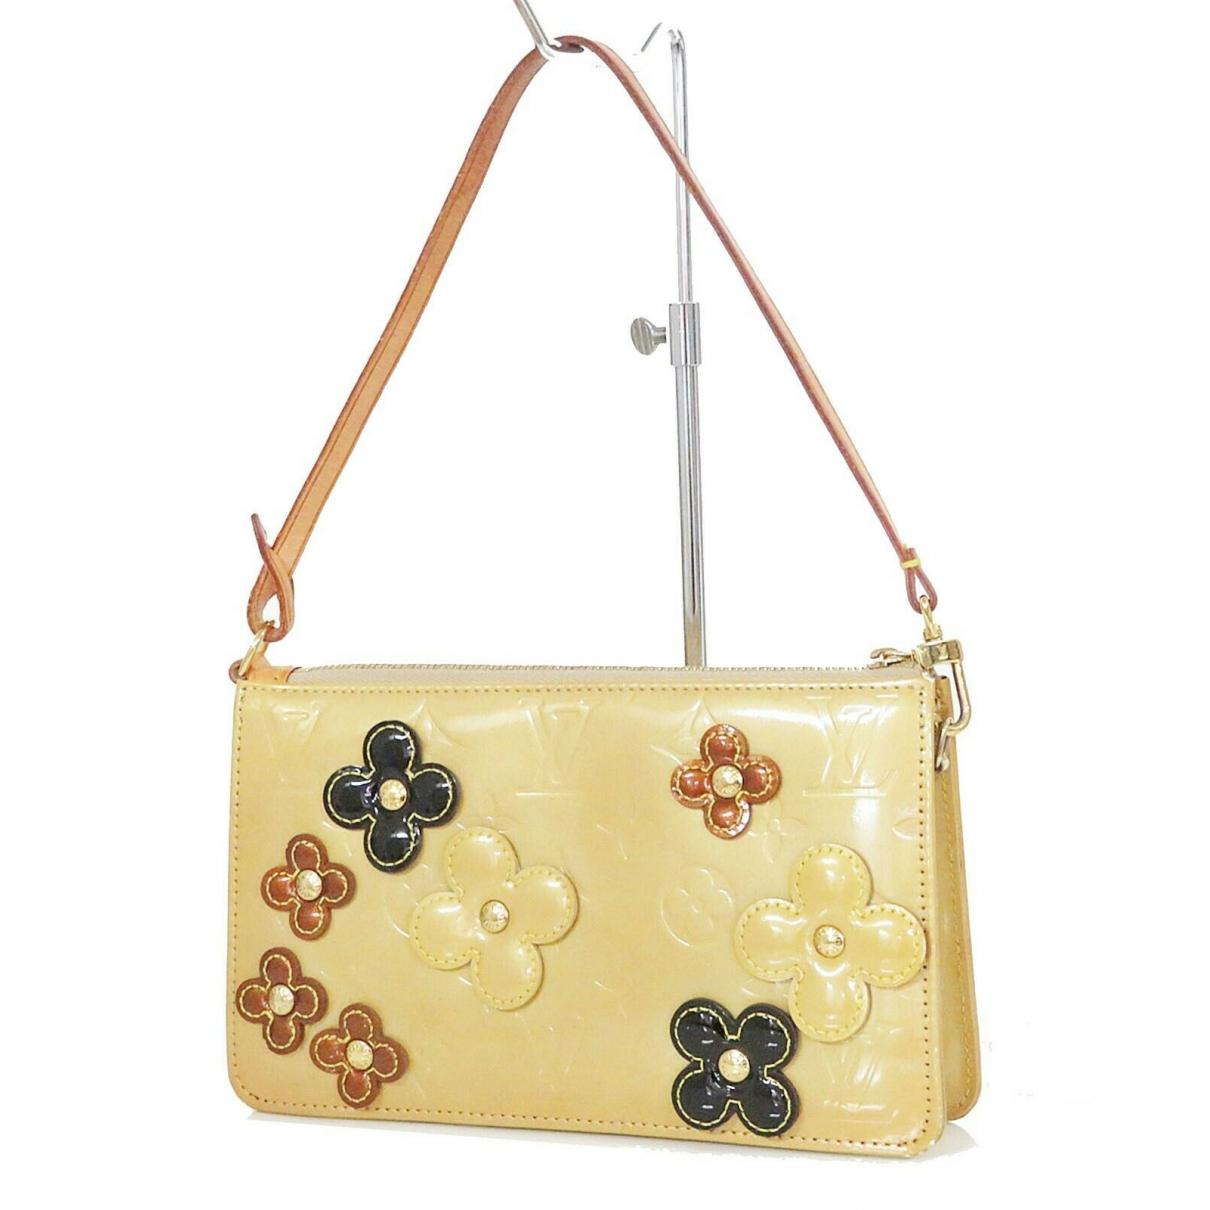 Louis Vuitton \N Leather handbag for Women \N